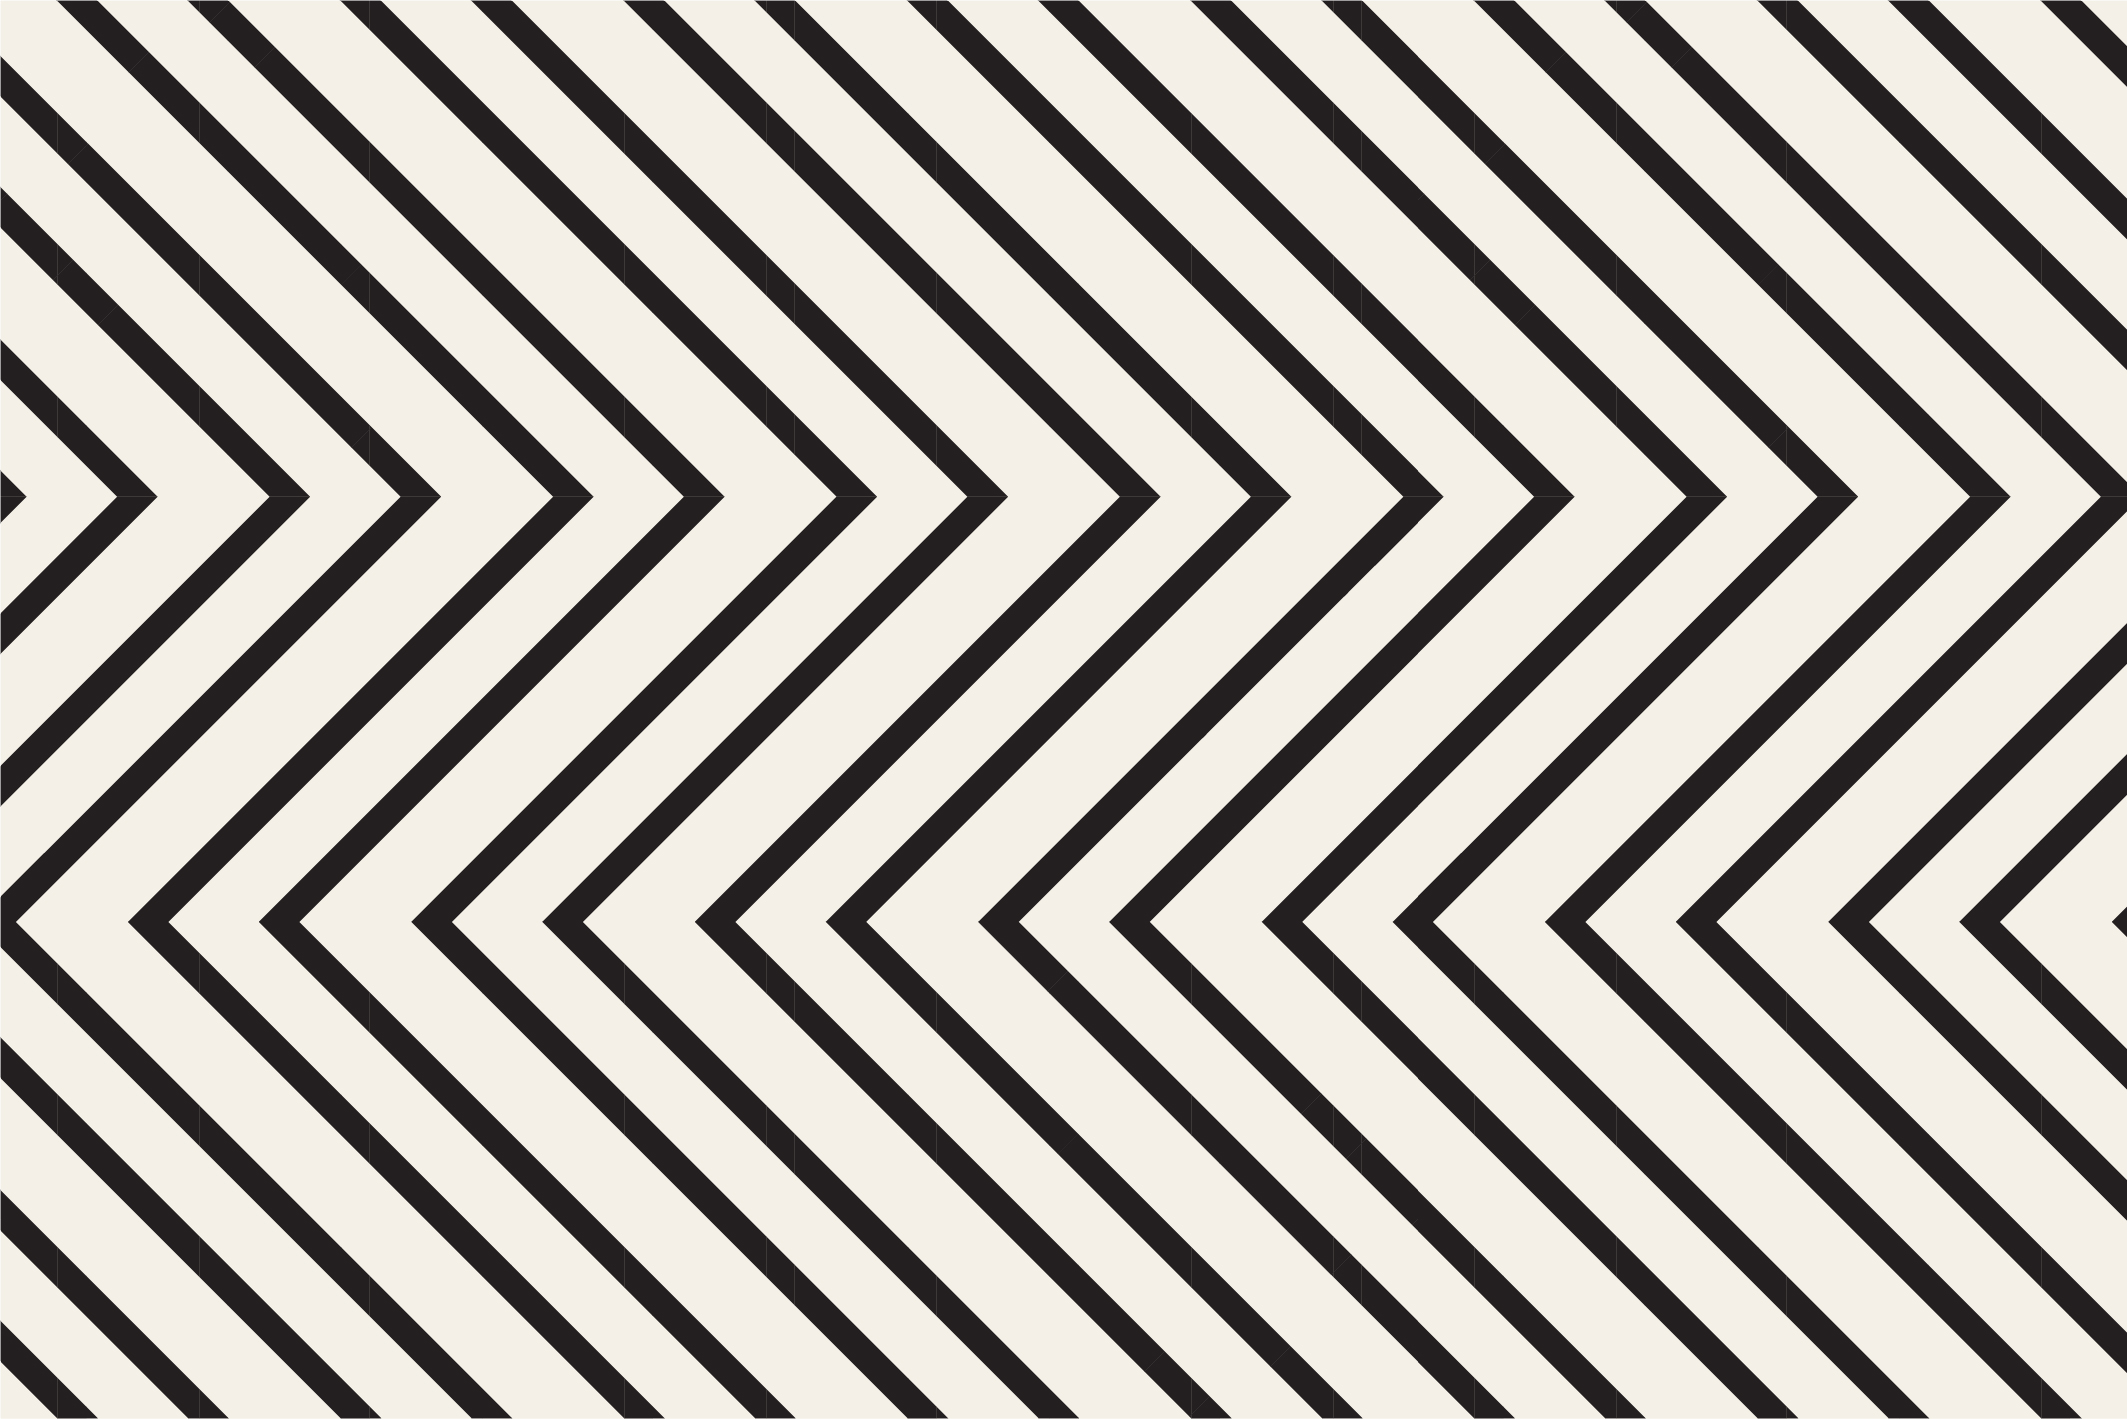 Geometric seamless patterns example image 9